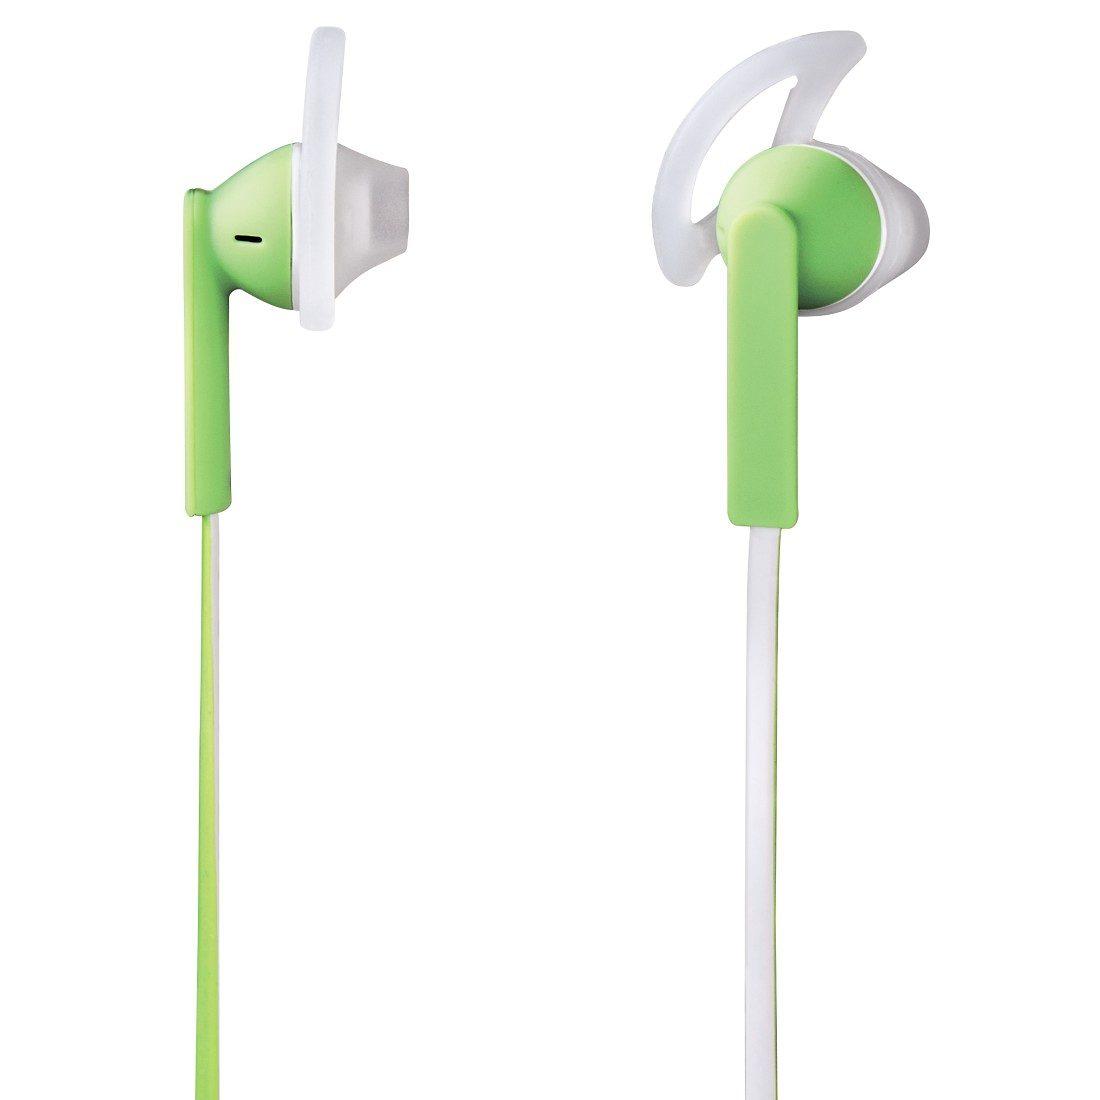 Hama Stereo-Ohrhörer Joy Sport, Grün/Weiß